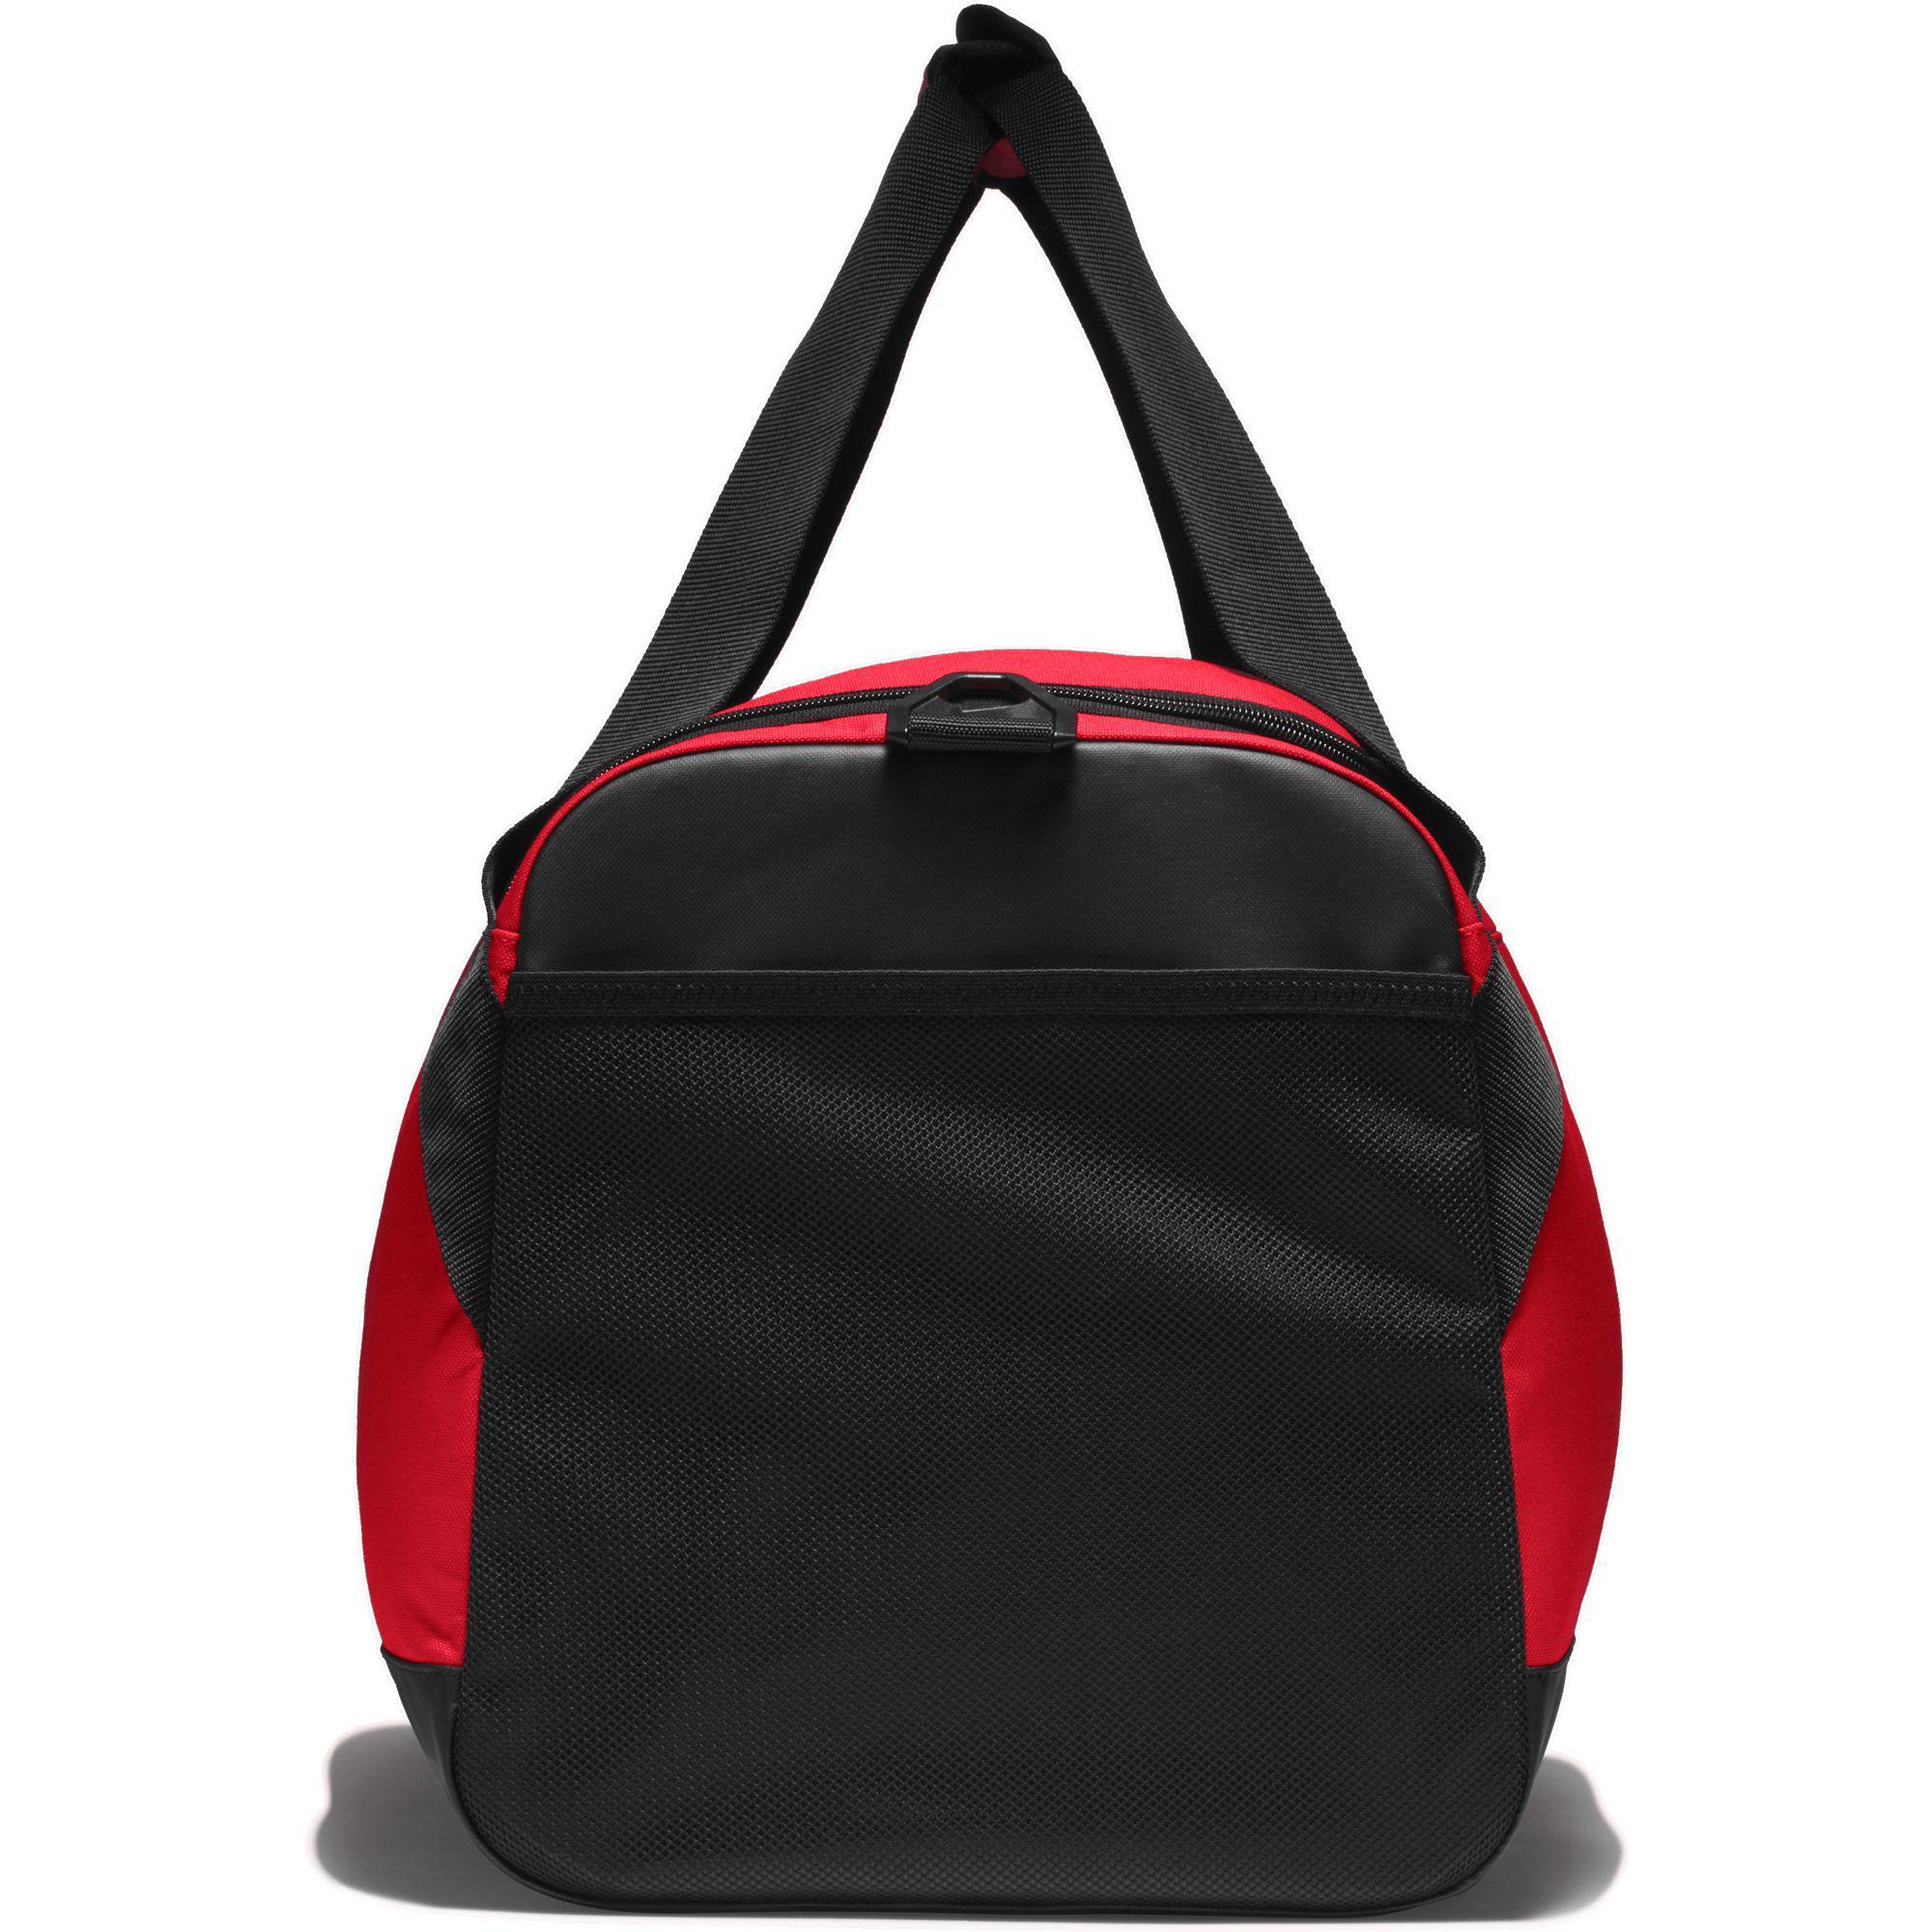 315f8b1d60 Nike Brasilia Medium Training Duffel Bag - University Red Black White